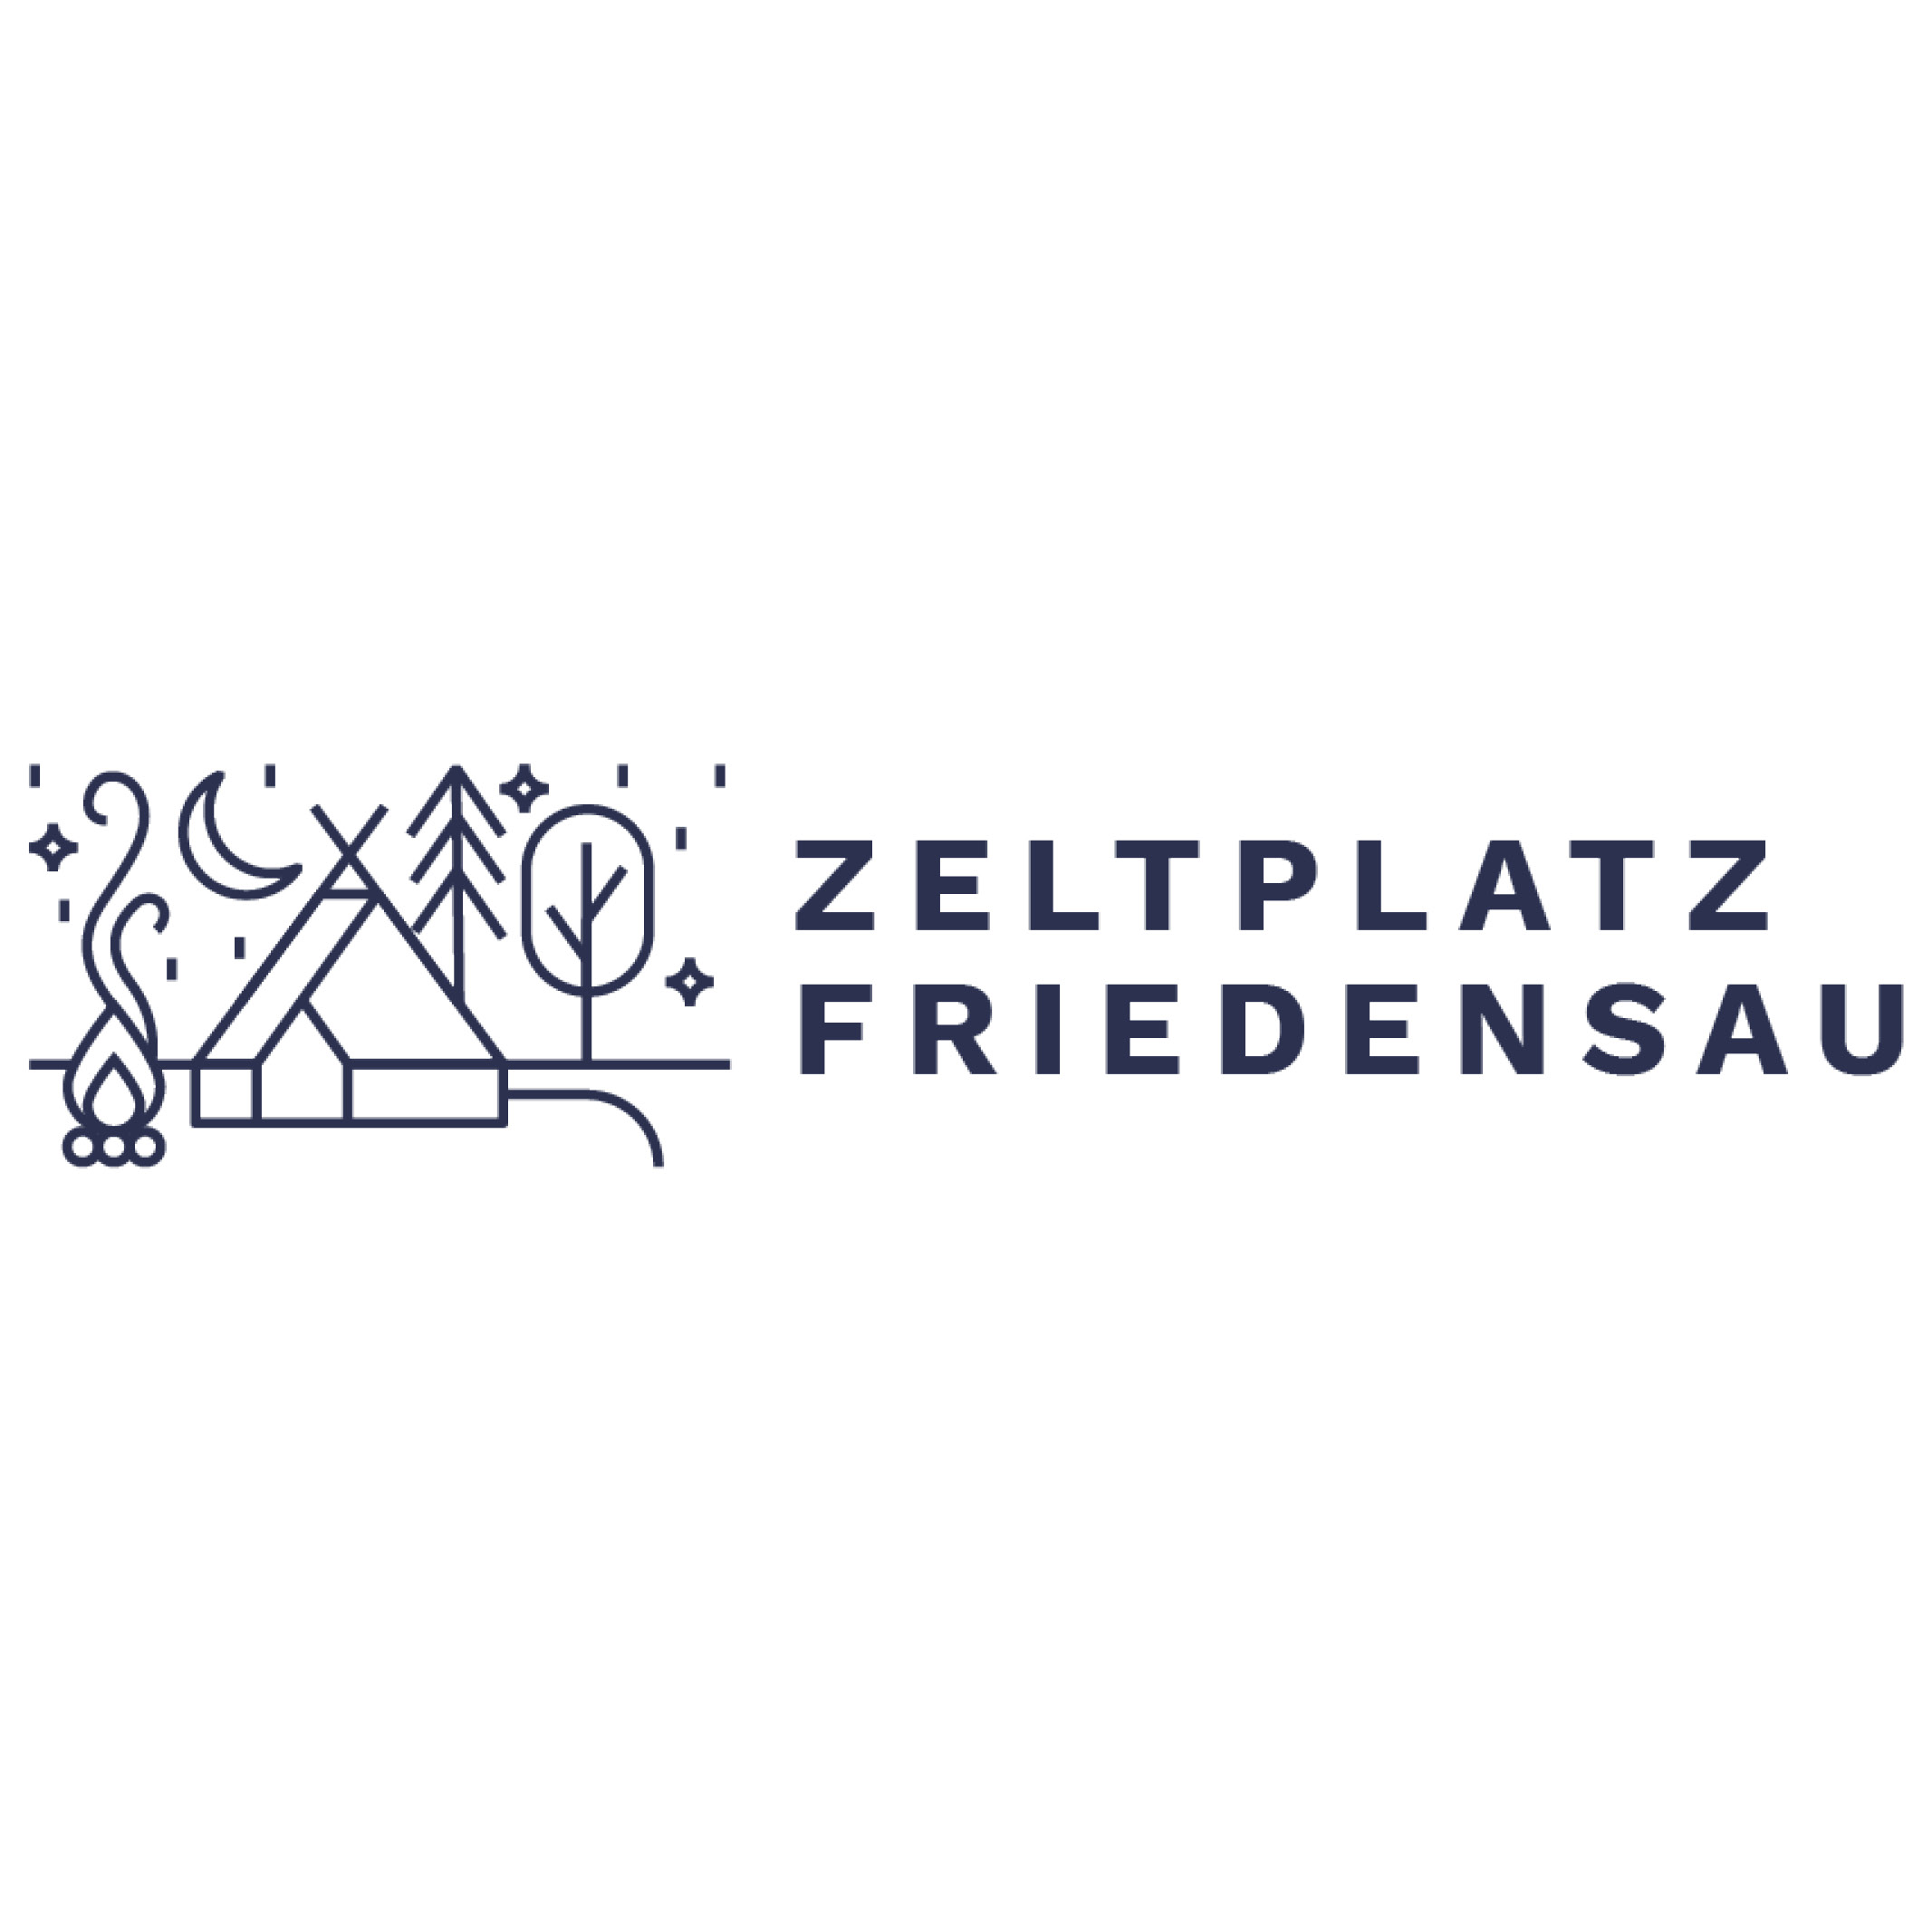 Zeltplatz Friedensau